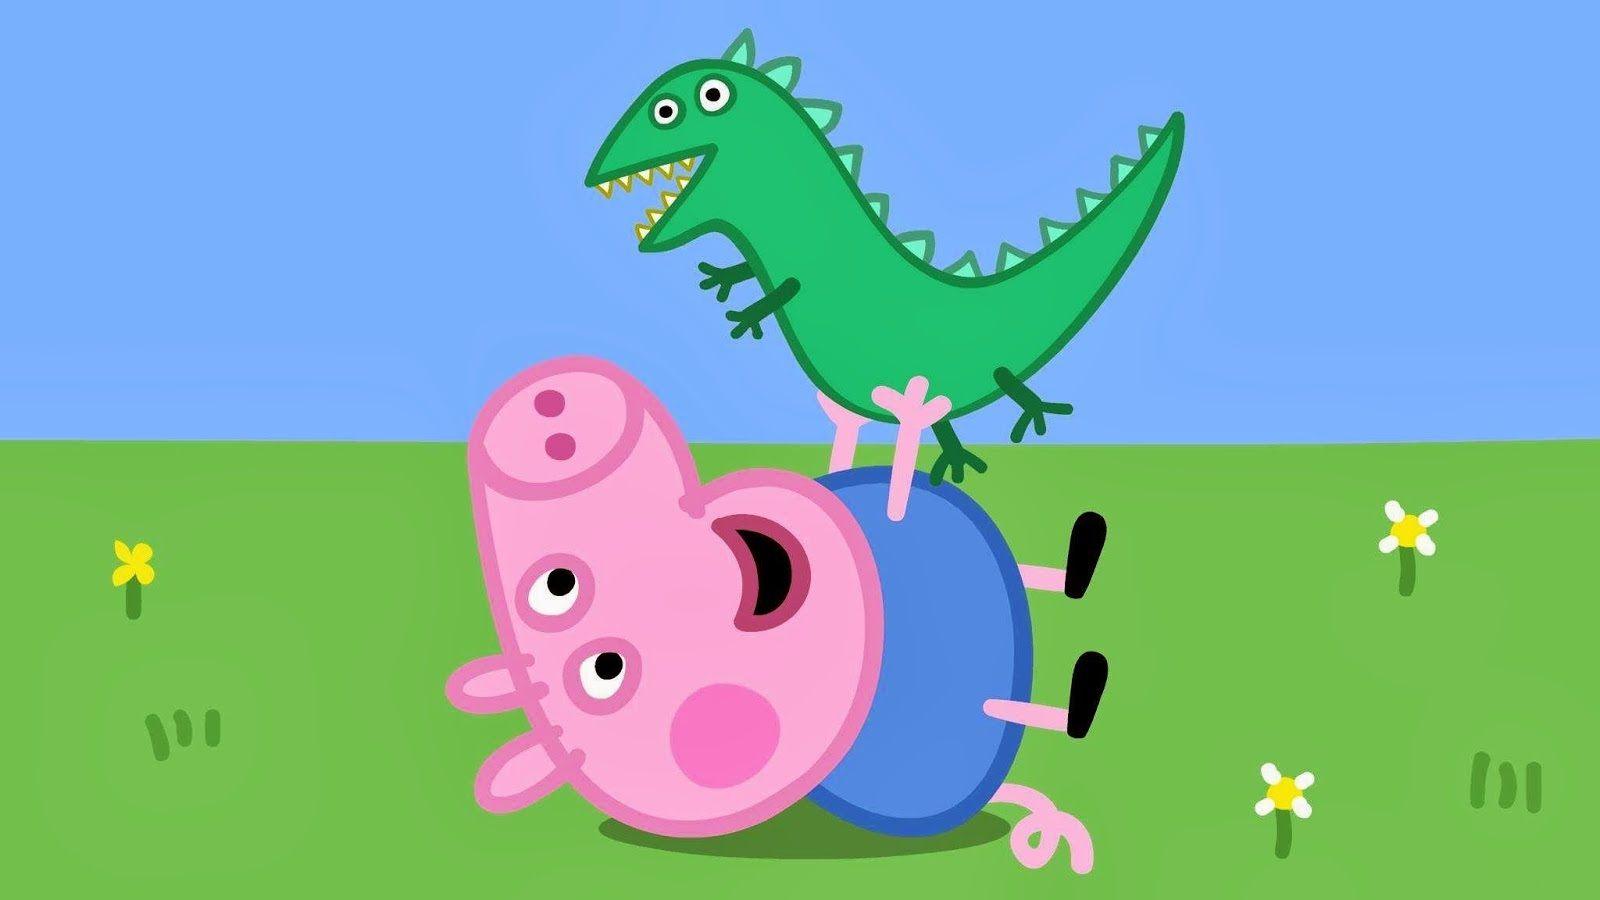 Free Peppa Pig Wallpaper Свинка пеппа, Свинки, Класс